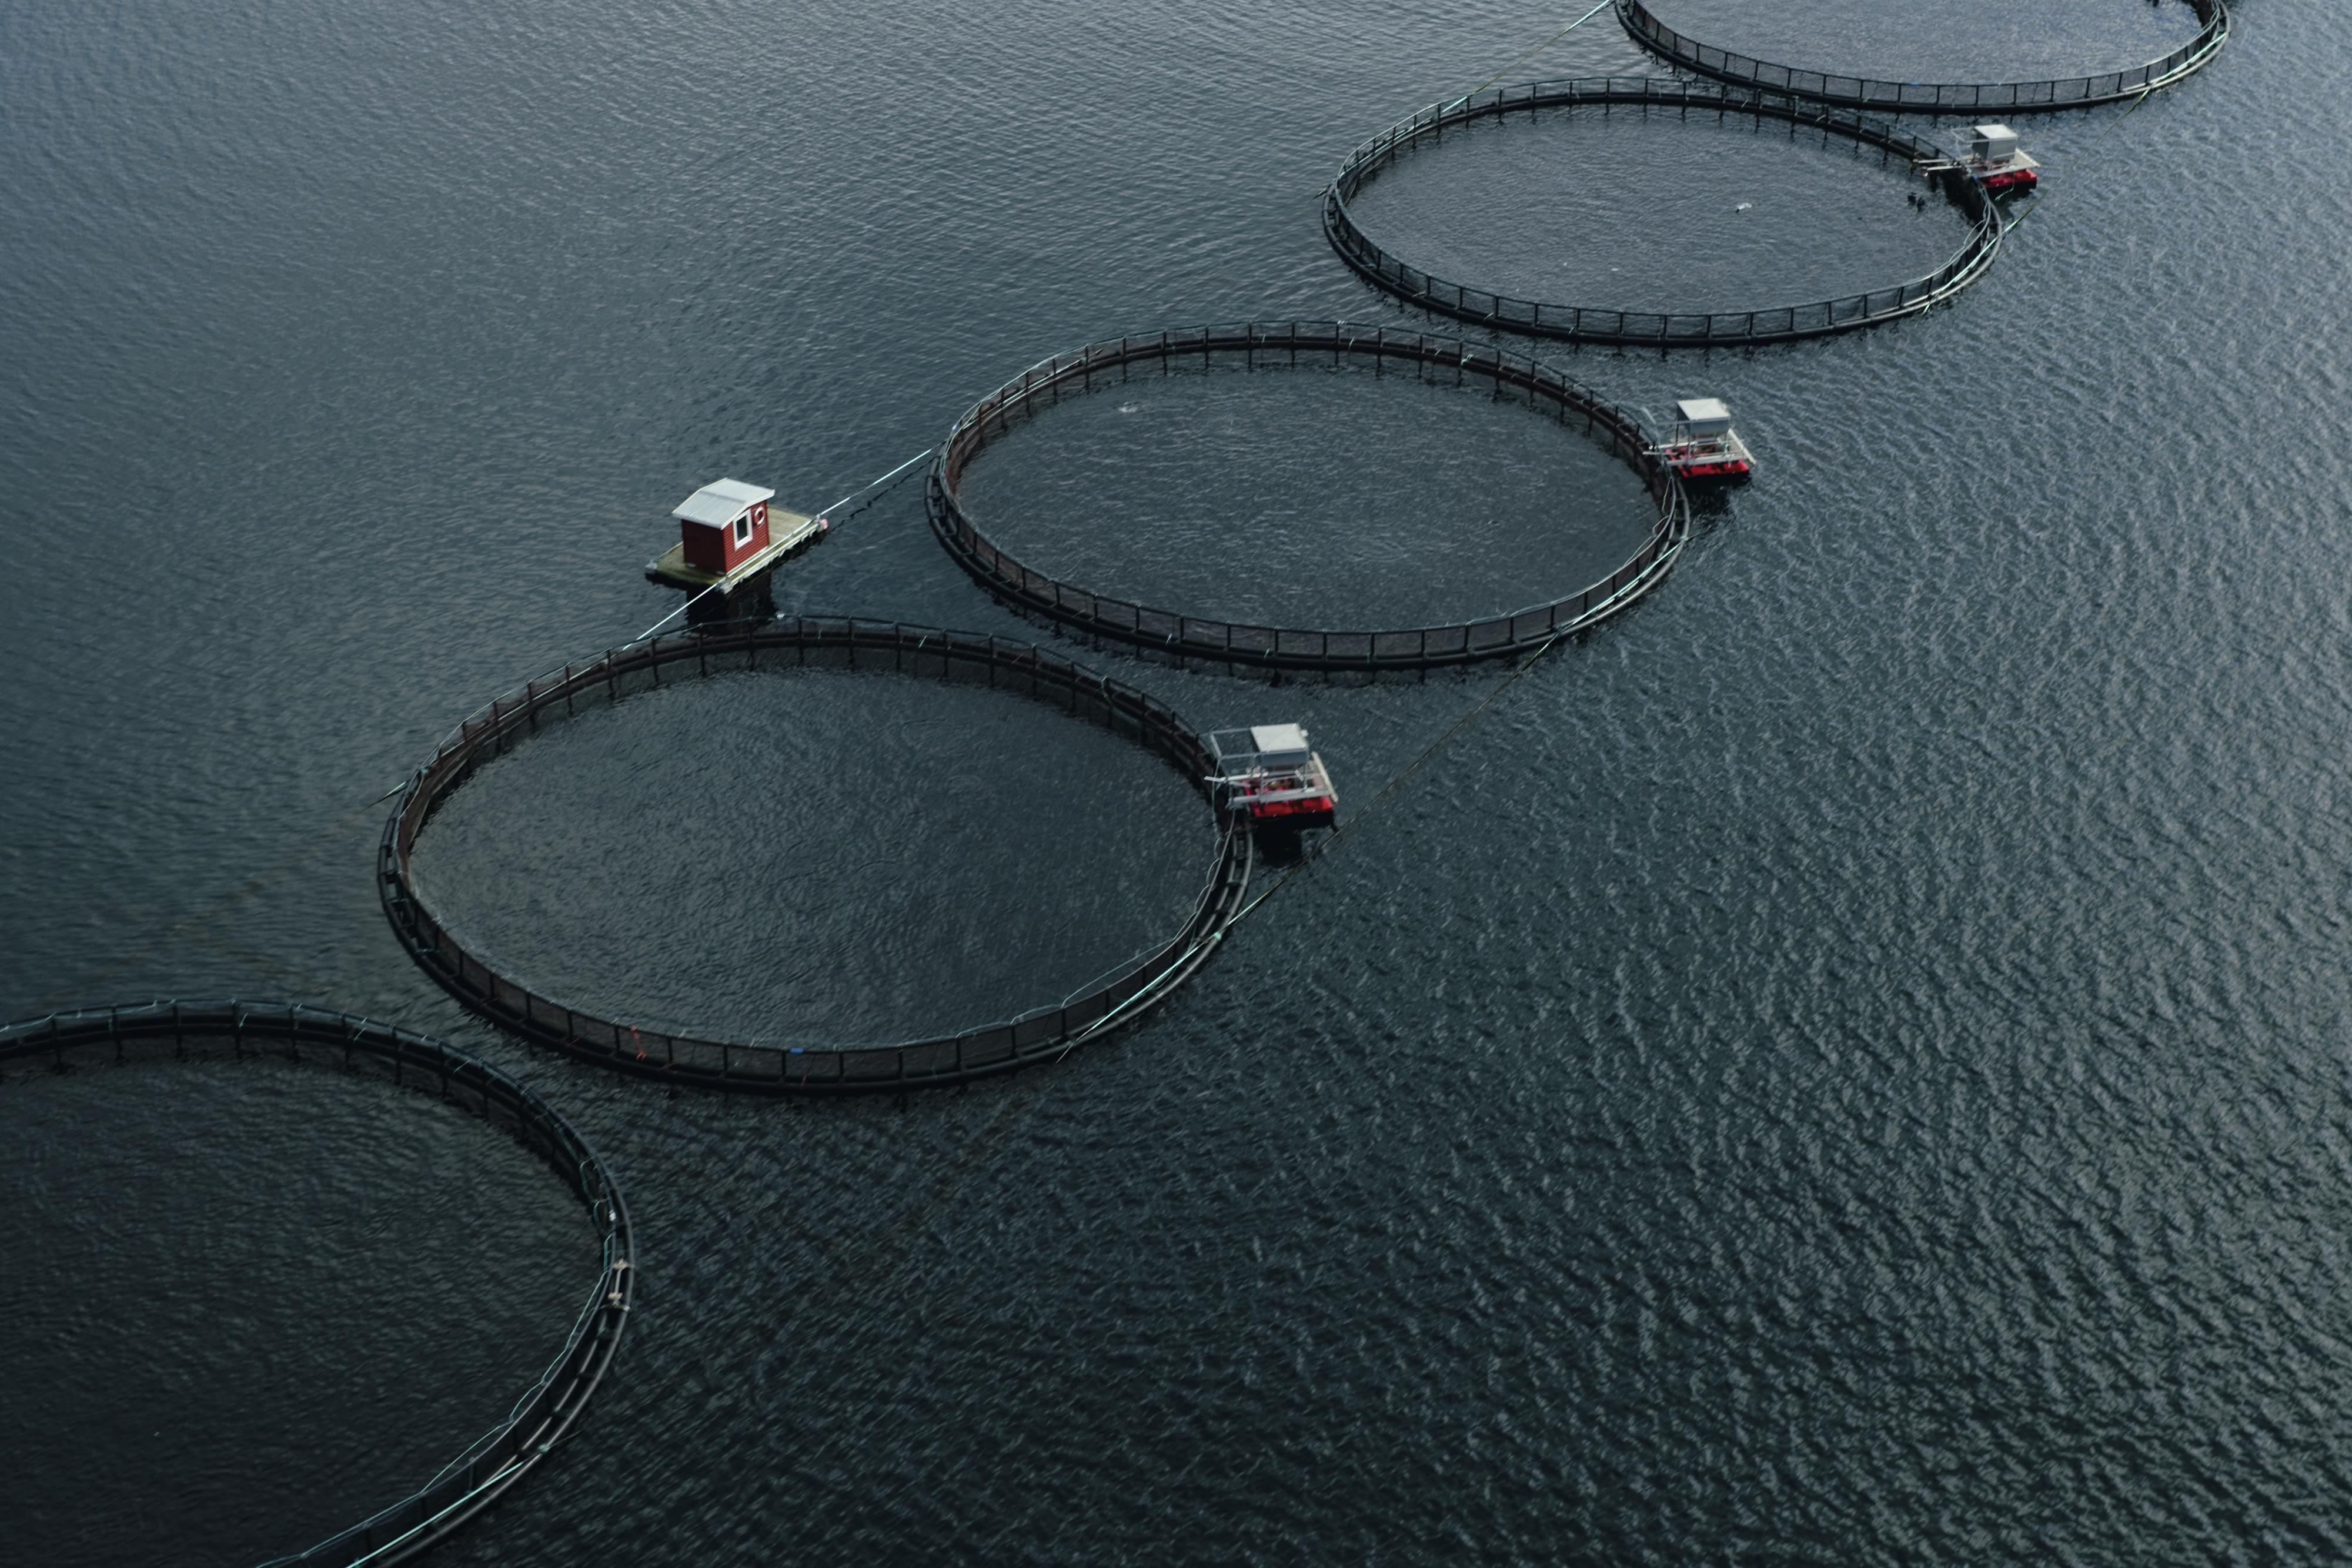 Norwegischer-Lachs-aus-Aquakultur-Fischfang-und-Aquakultur